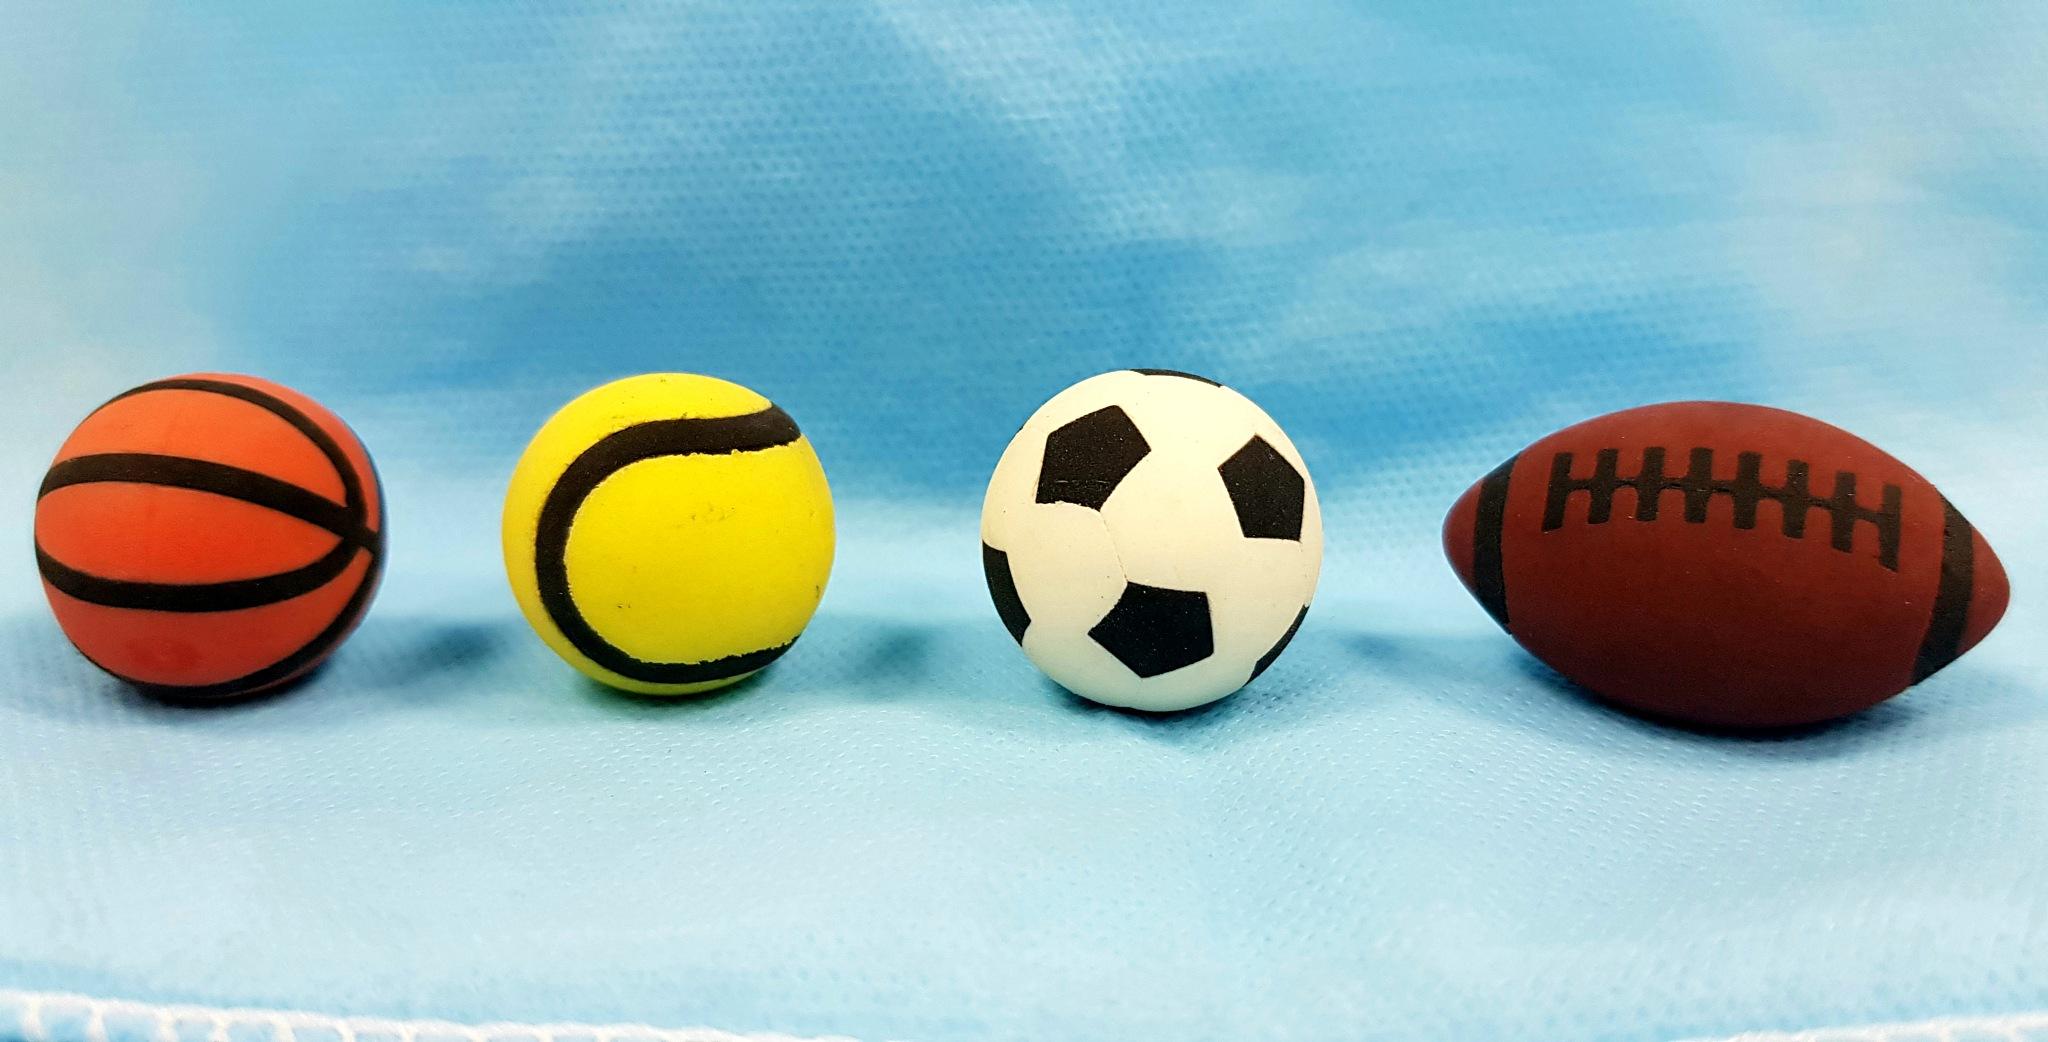 Balls by WillS8